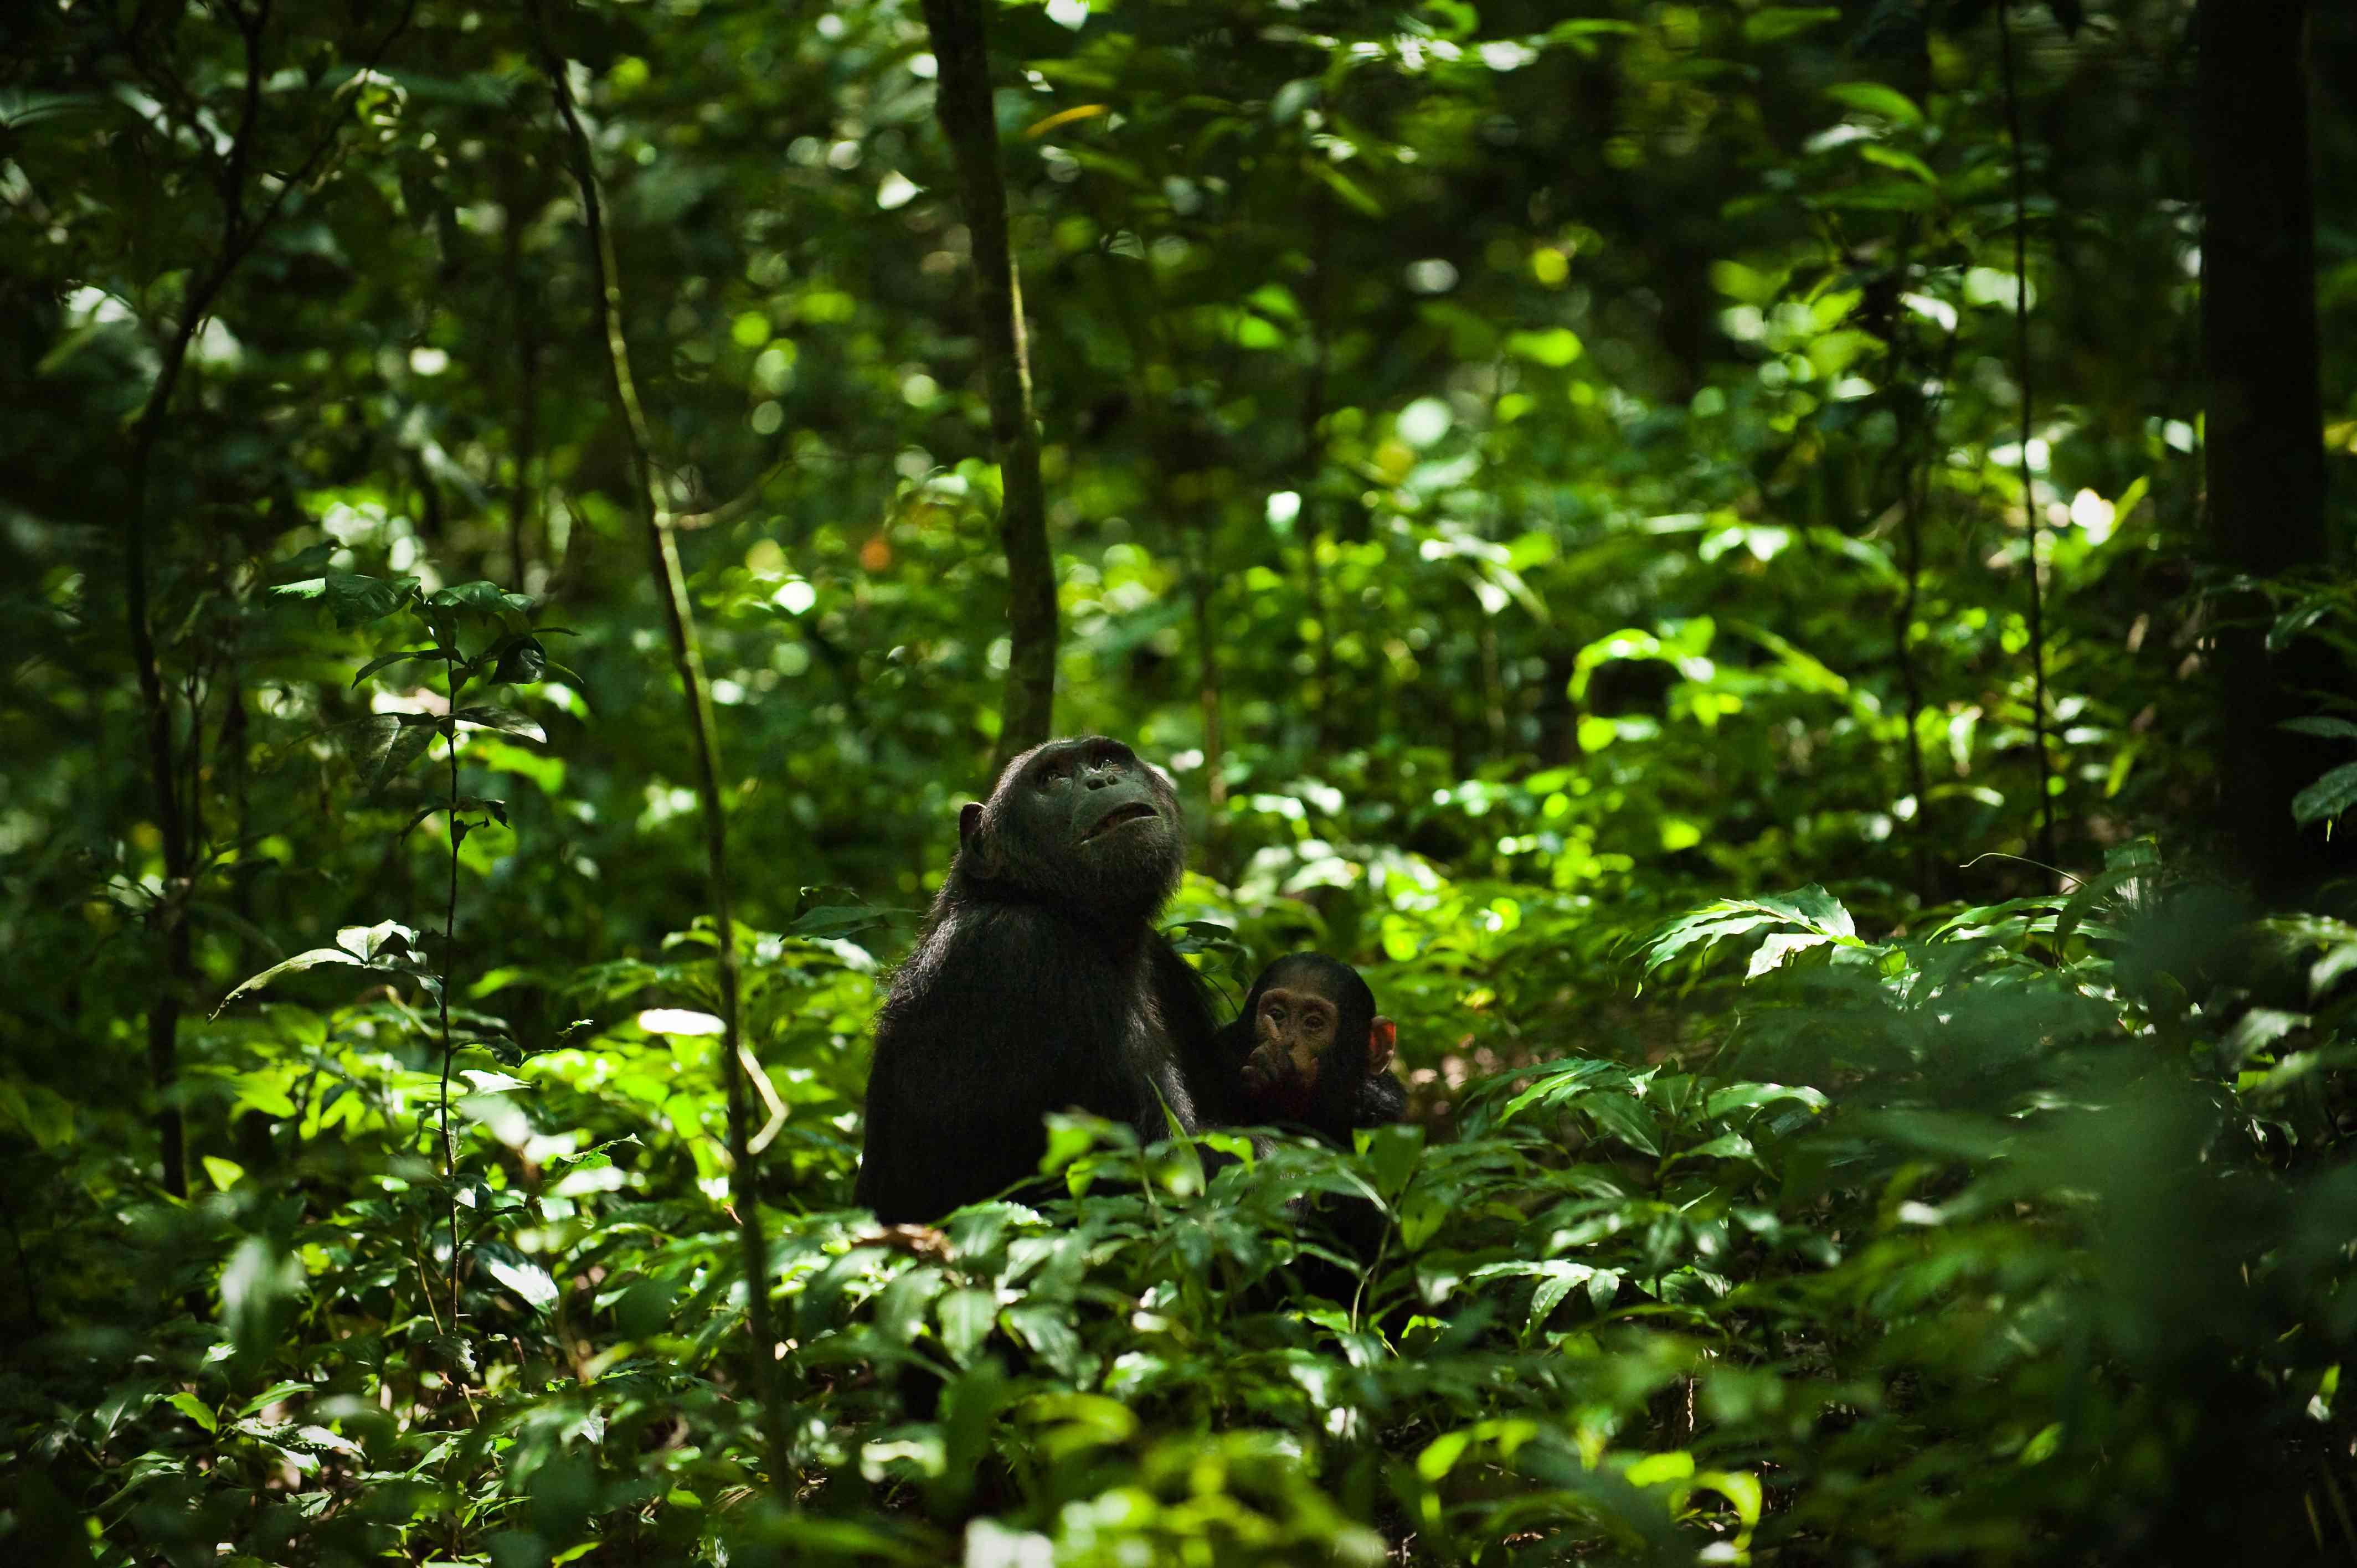 Pair of common chimpanzees (Pan troglodytes), Kibale Forest National Park, Uganda